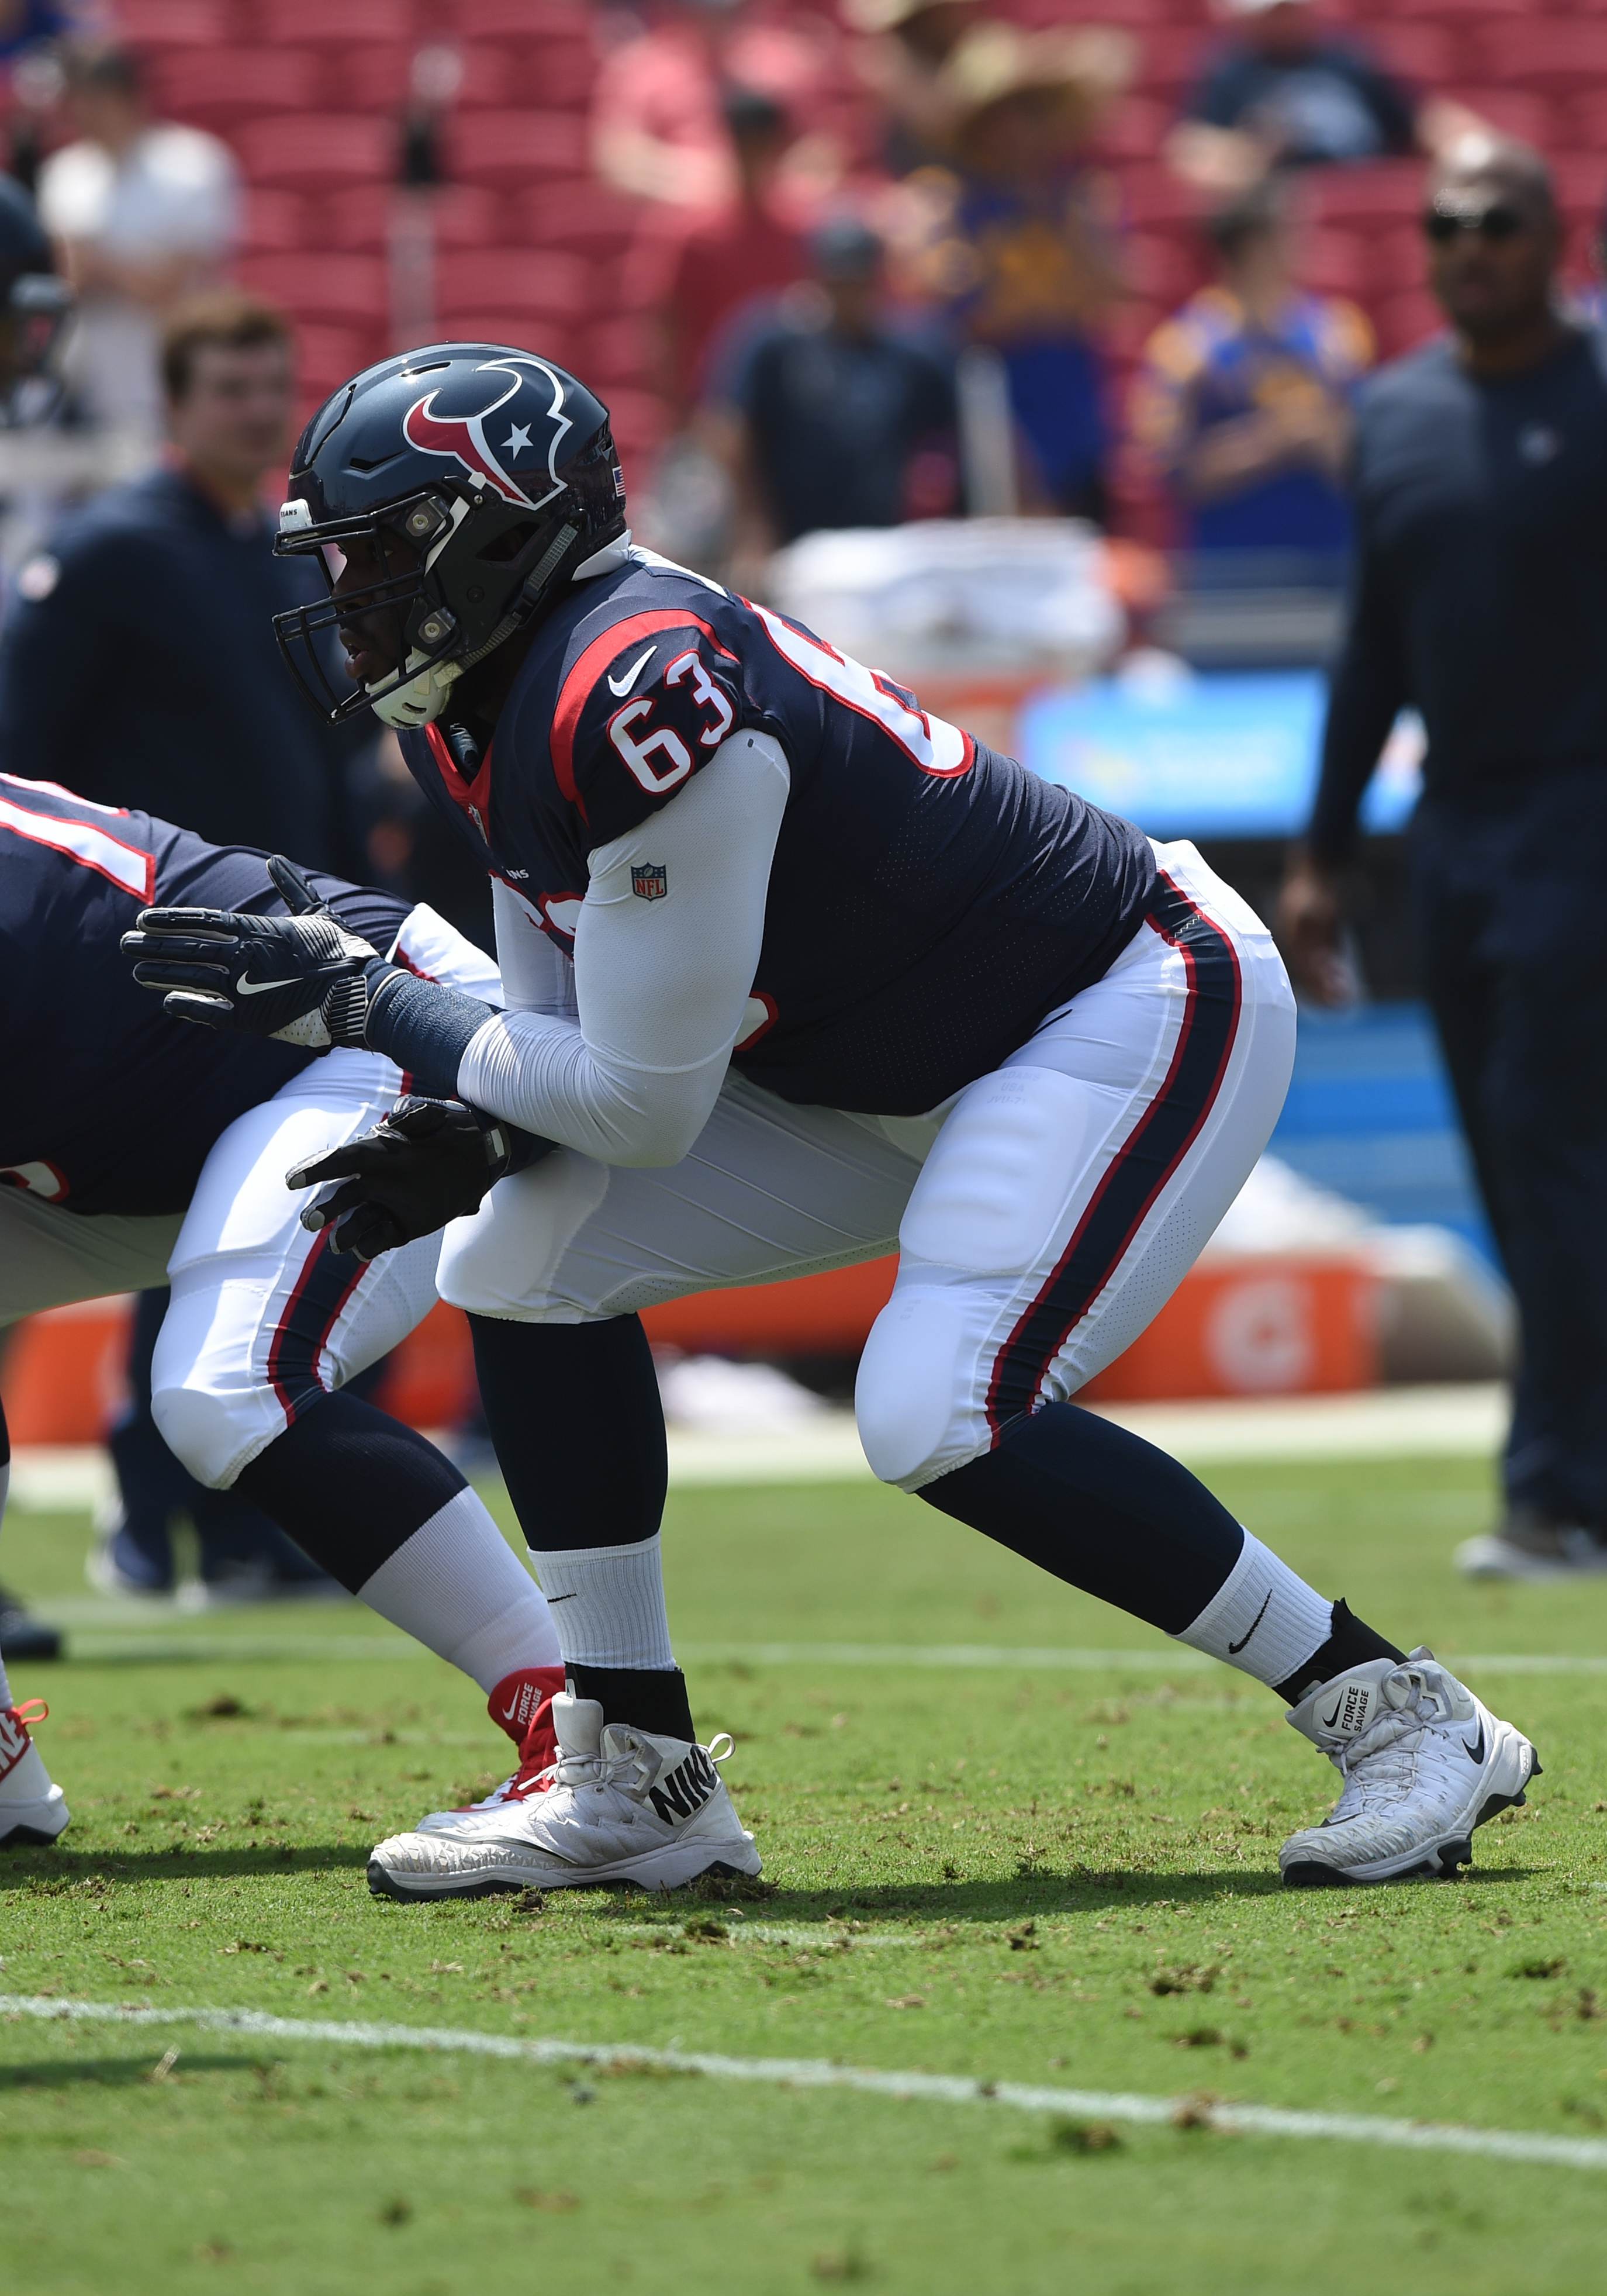 NFL: AUG 25 Preseason - Texans at Rams